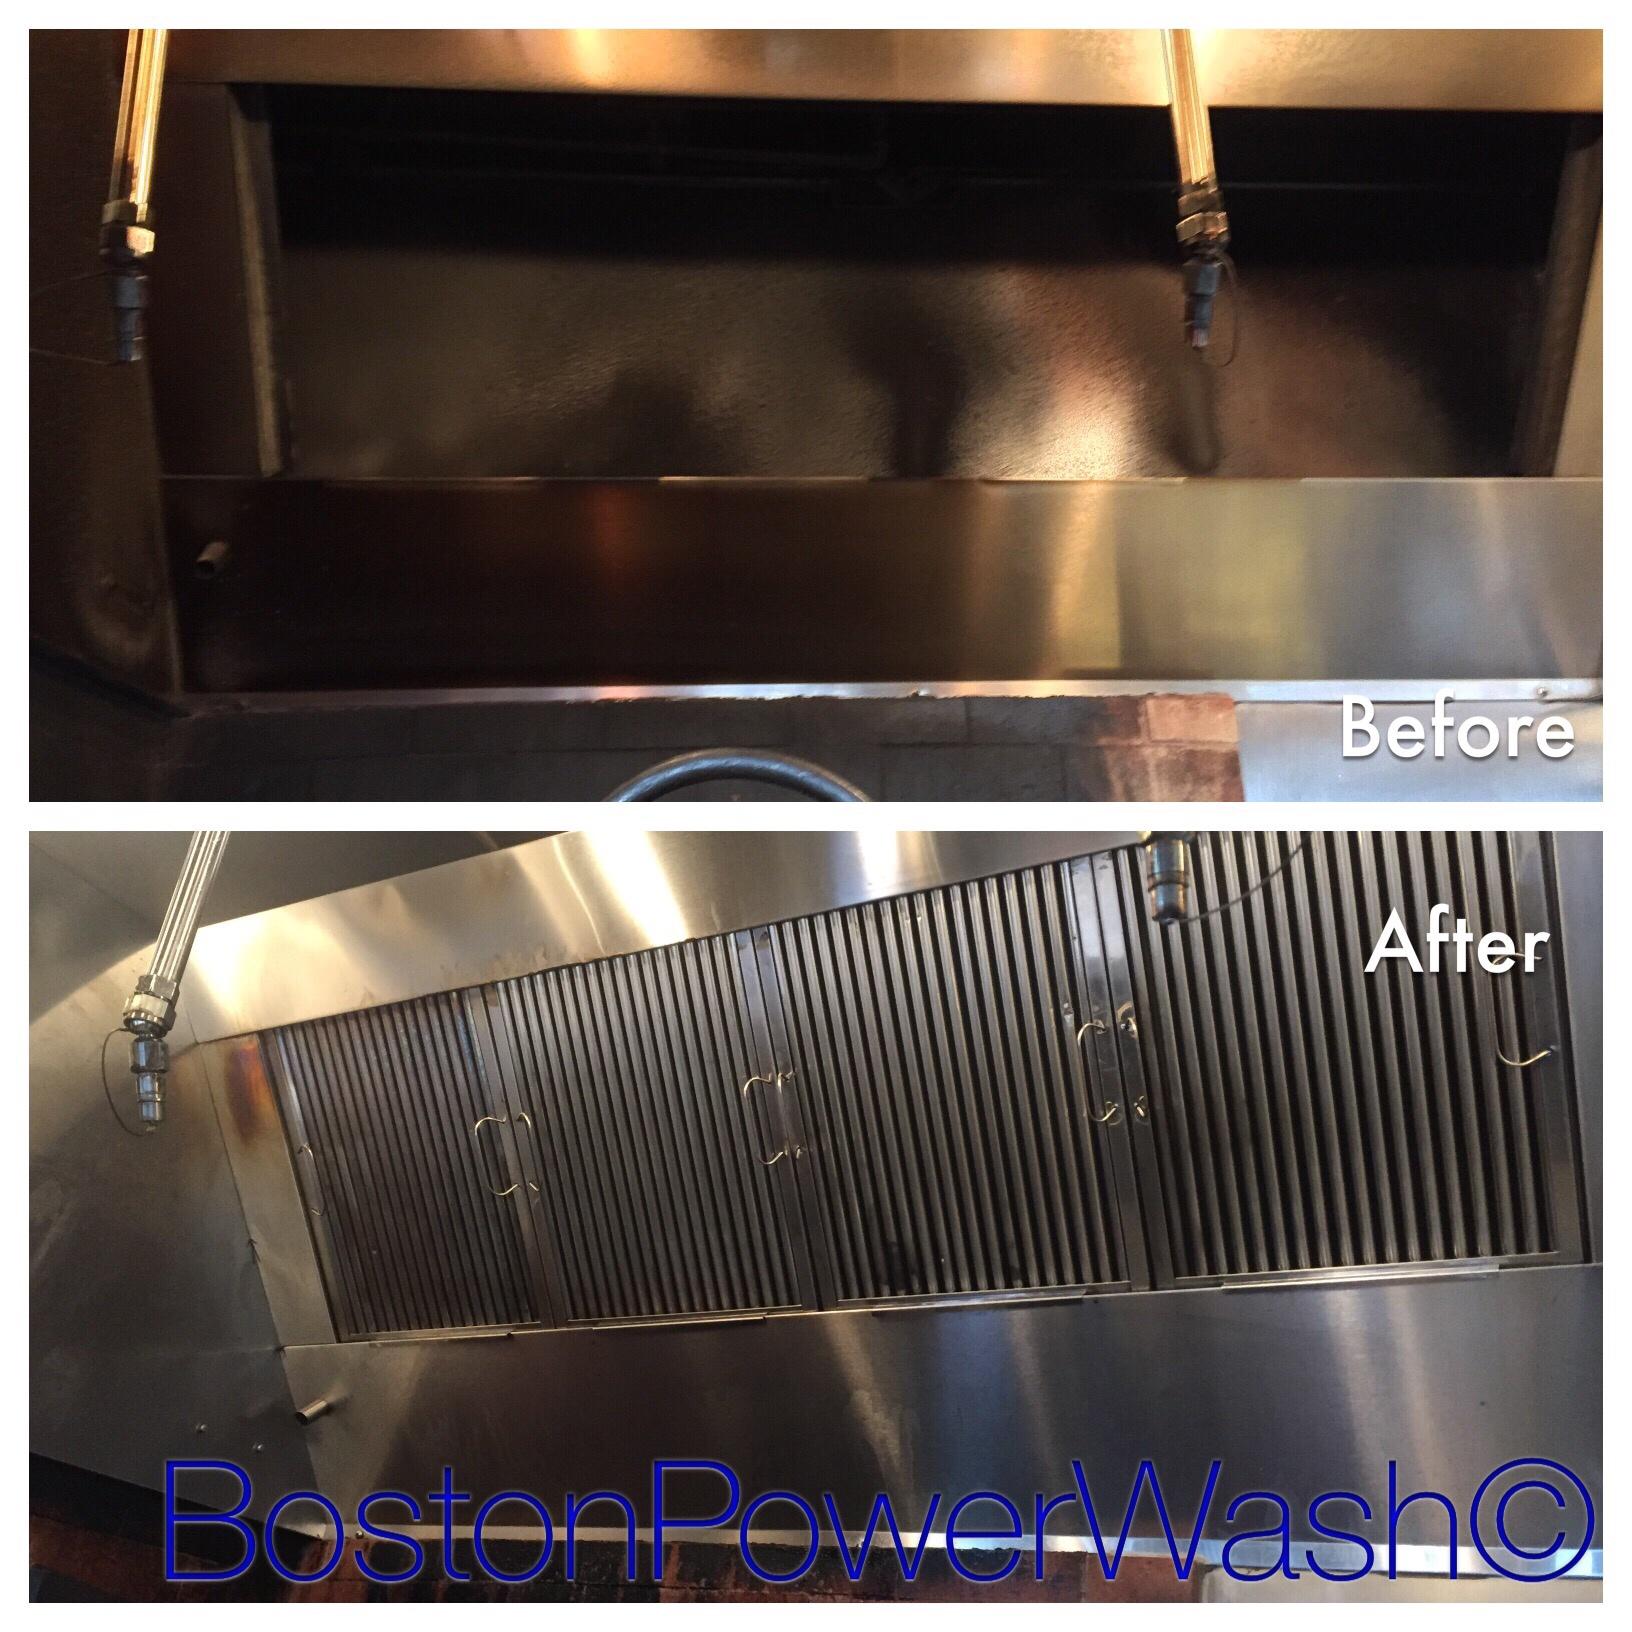 Boston Power Wash - Restaurants